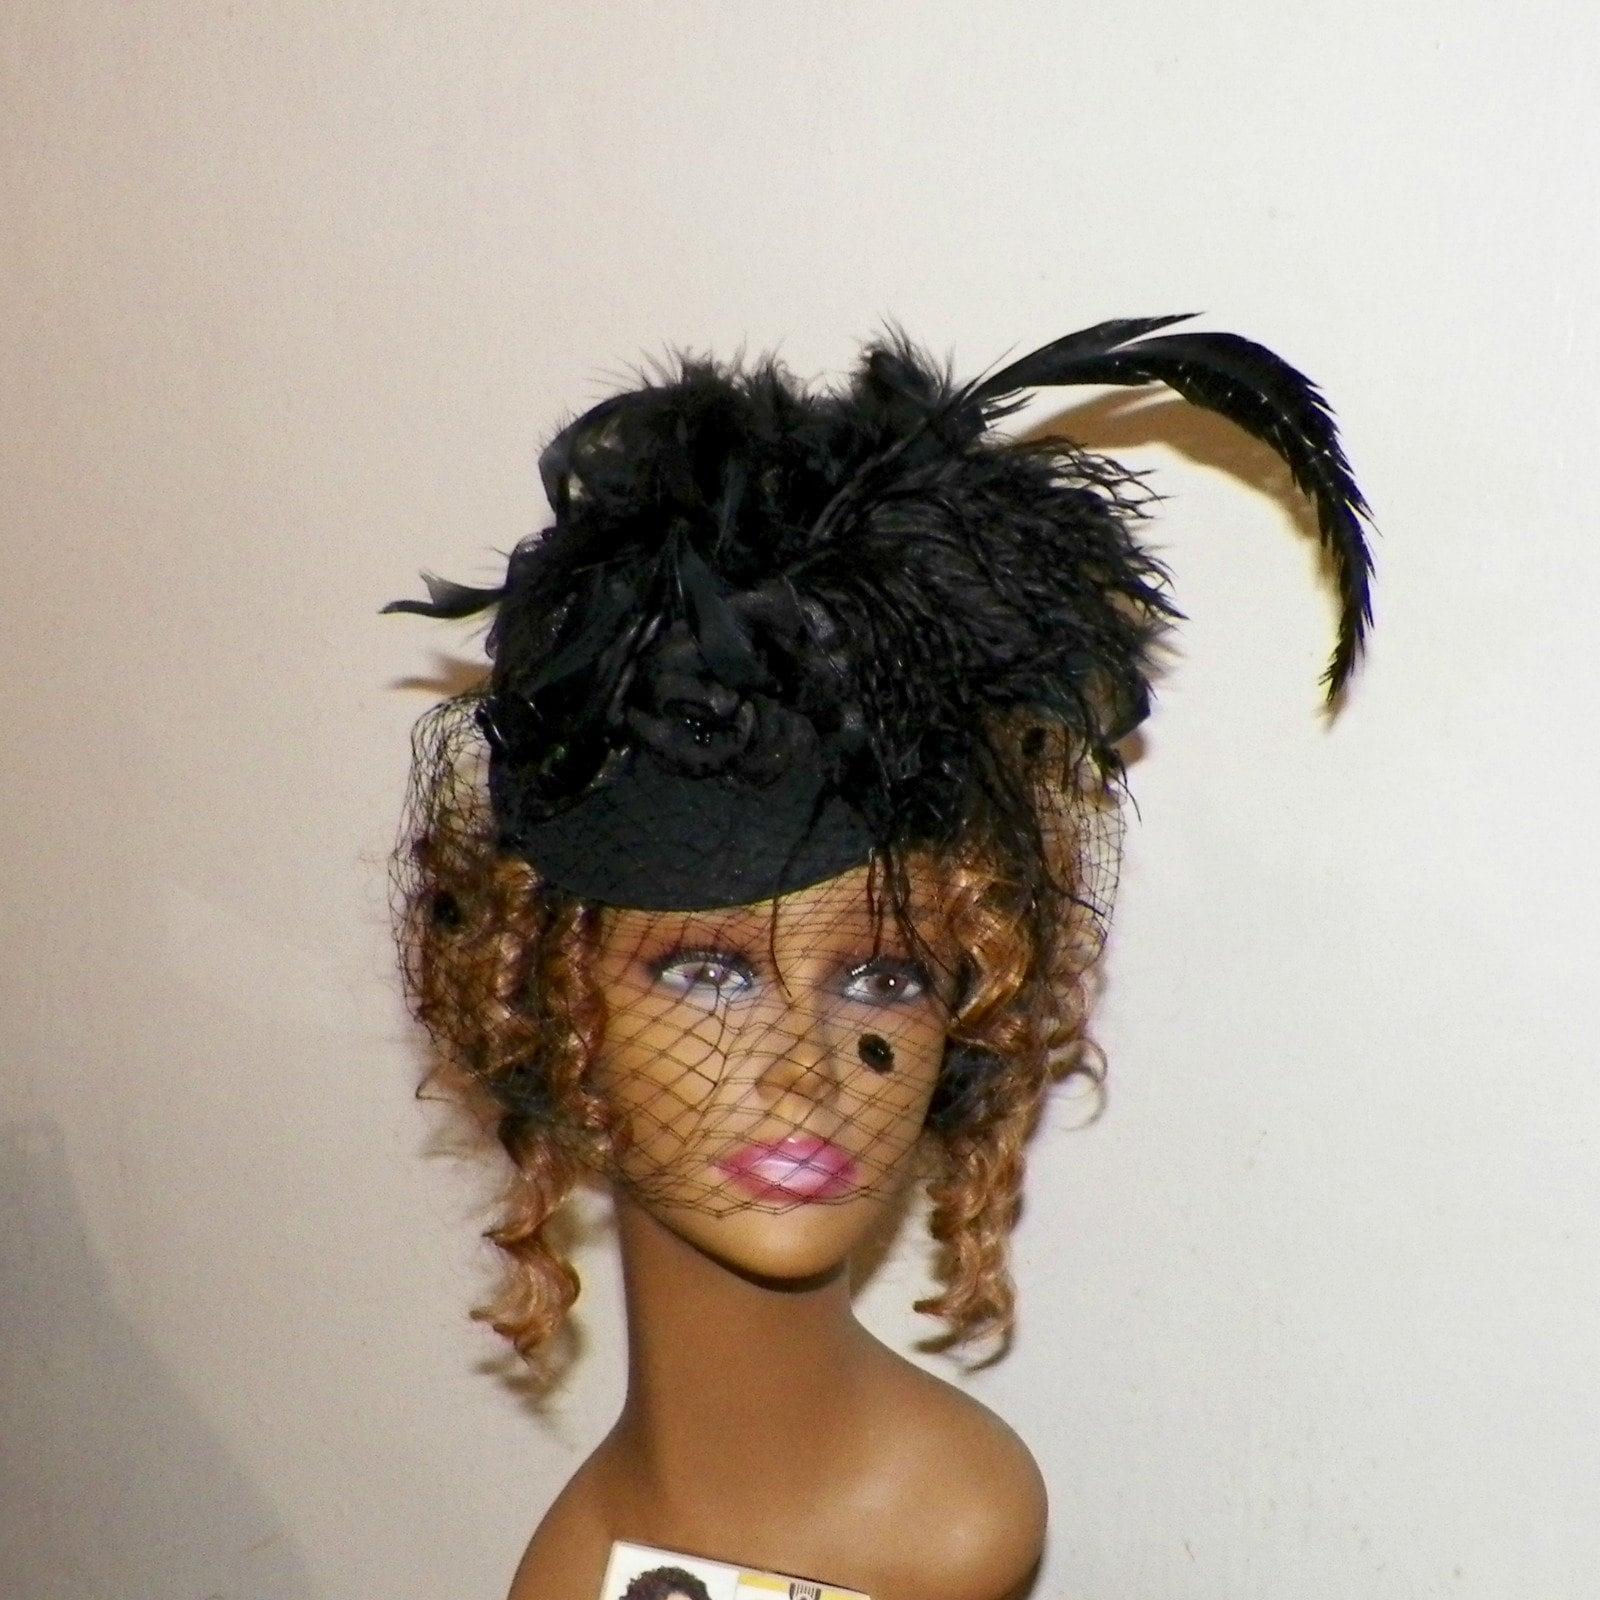 Fascinator,Black,Bird,Hat,Raven,Steampunk,Headdress,Victorian,Gothic,Marie,Antoinette,Lolita,Costume,Headpiece,By,Nevermore,Accessories,victorian_hat,gothic_headdress,gothic_headpiece,gothic_fascinator,steampunk_hat,feather_headdress,bird_fascinator,raven_fascinator,bird_hat,raven_hat,feather_fascinator,black_bird_hat,raven_nevermore